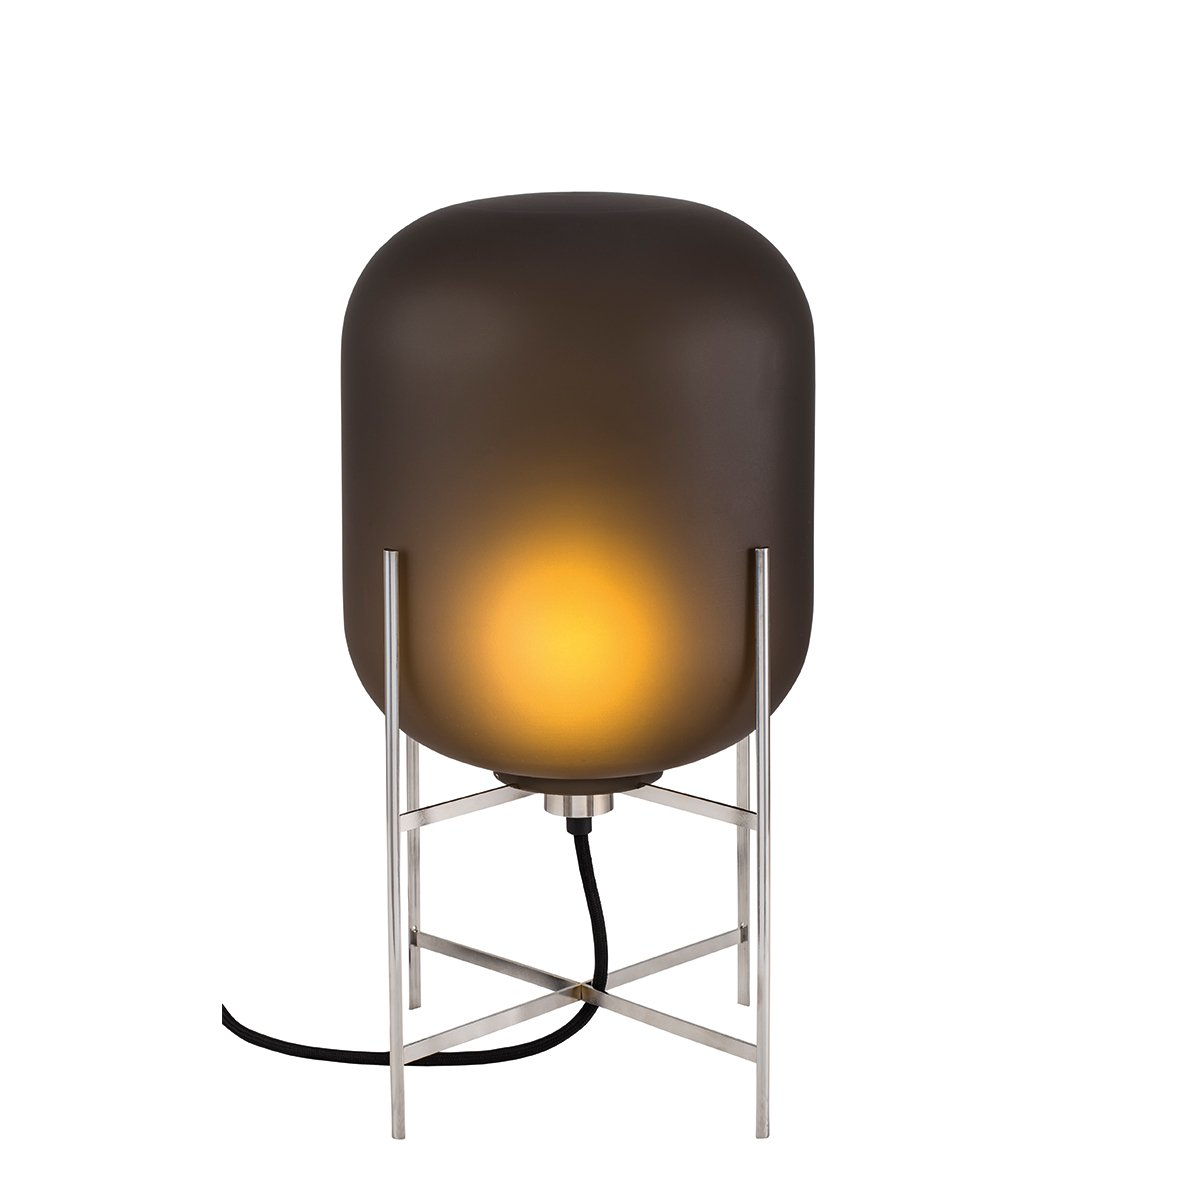 Pulpo Oda Tafellamp Small - Mat Smoke Grey - Chroom